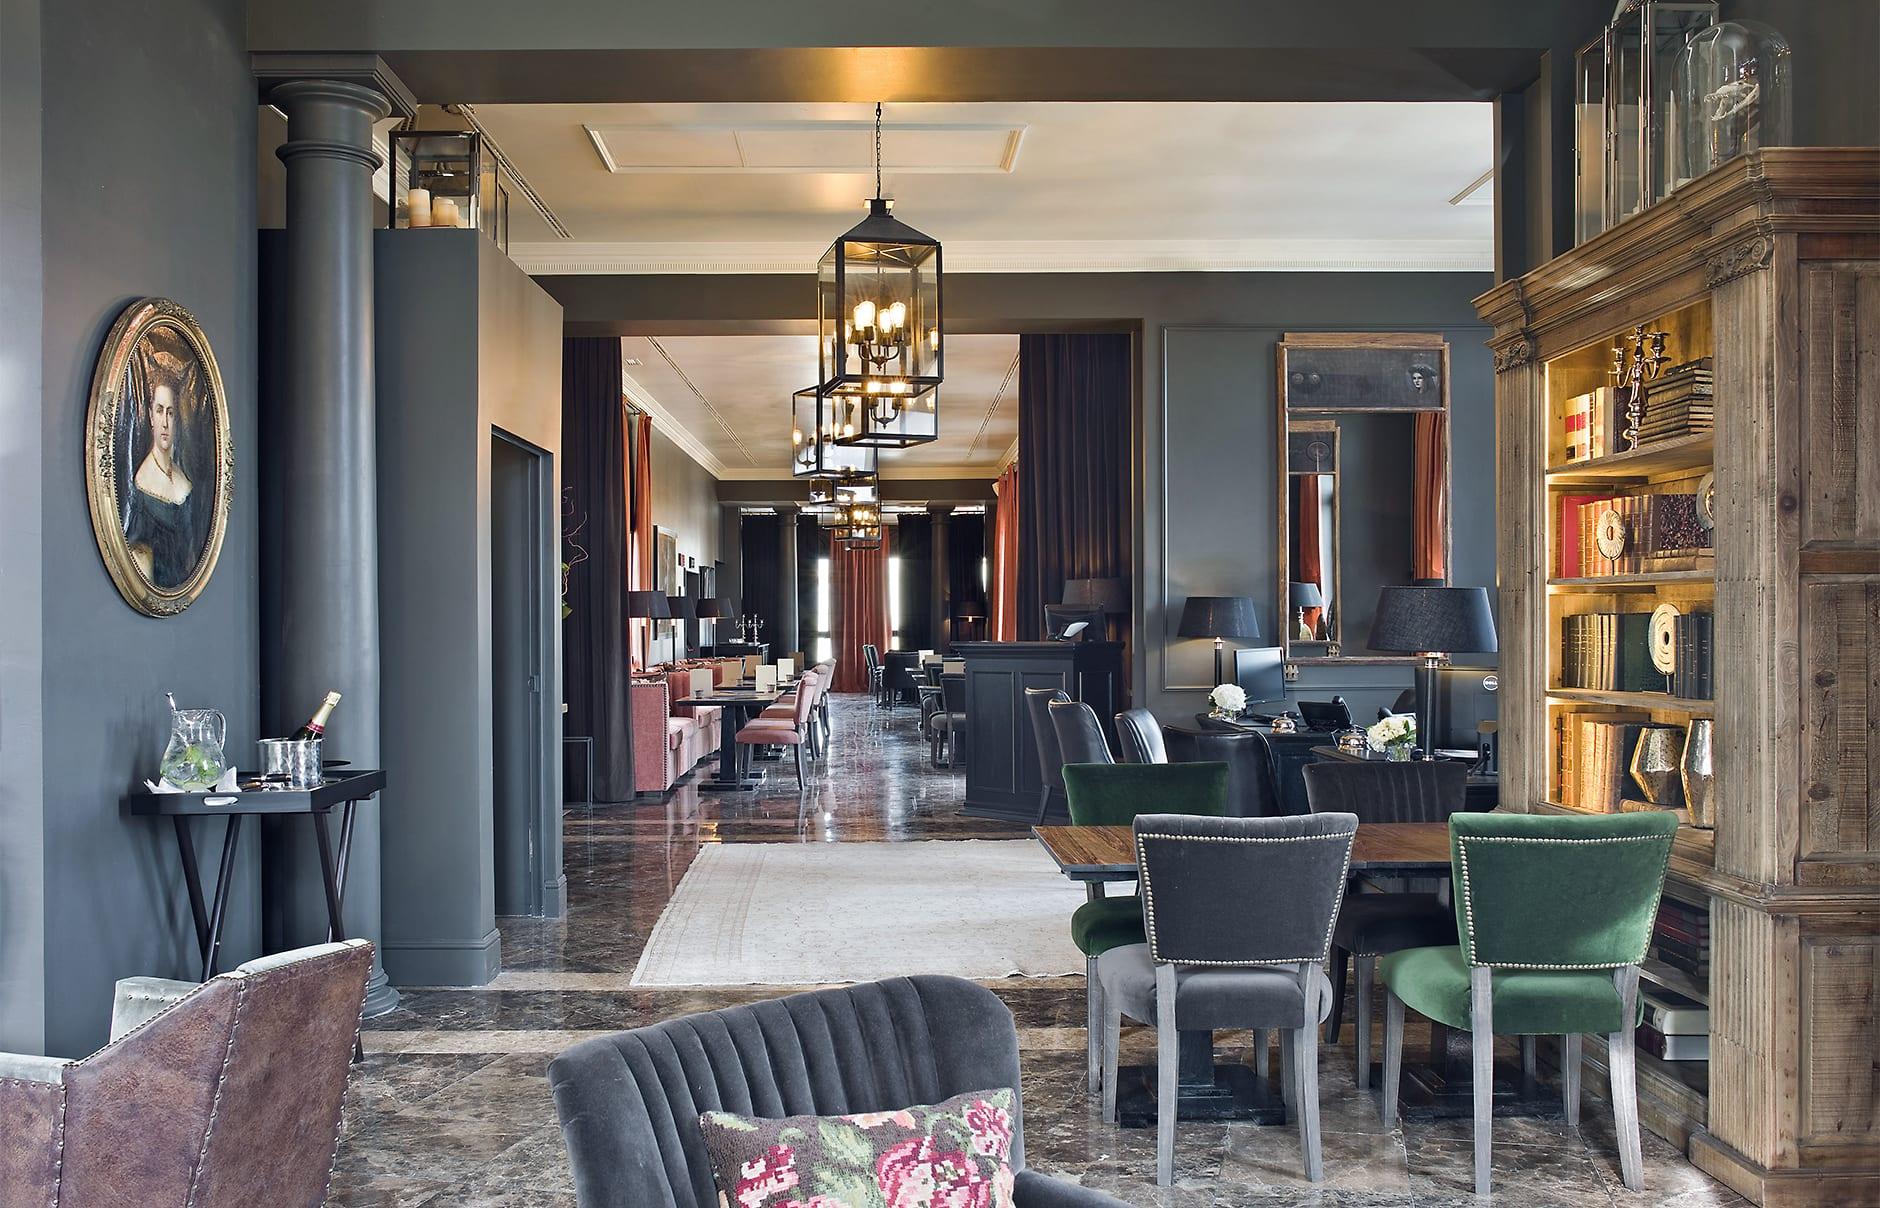 Ático. The Principal Madrid, Spain. Hotel Review by TravelPlusStyle. Photo © The Principal Madrid